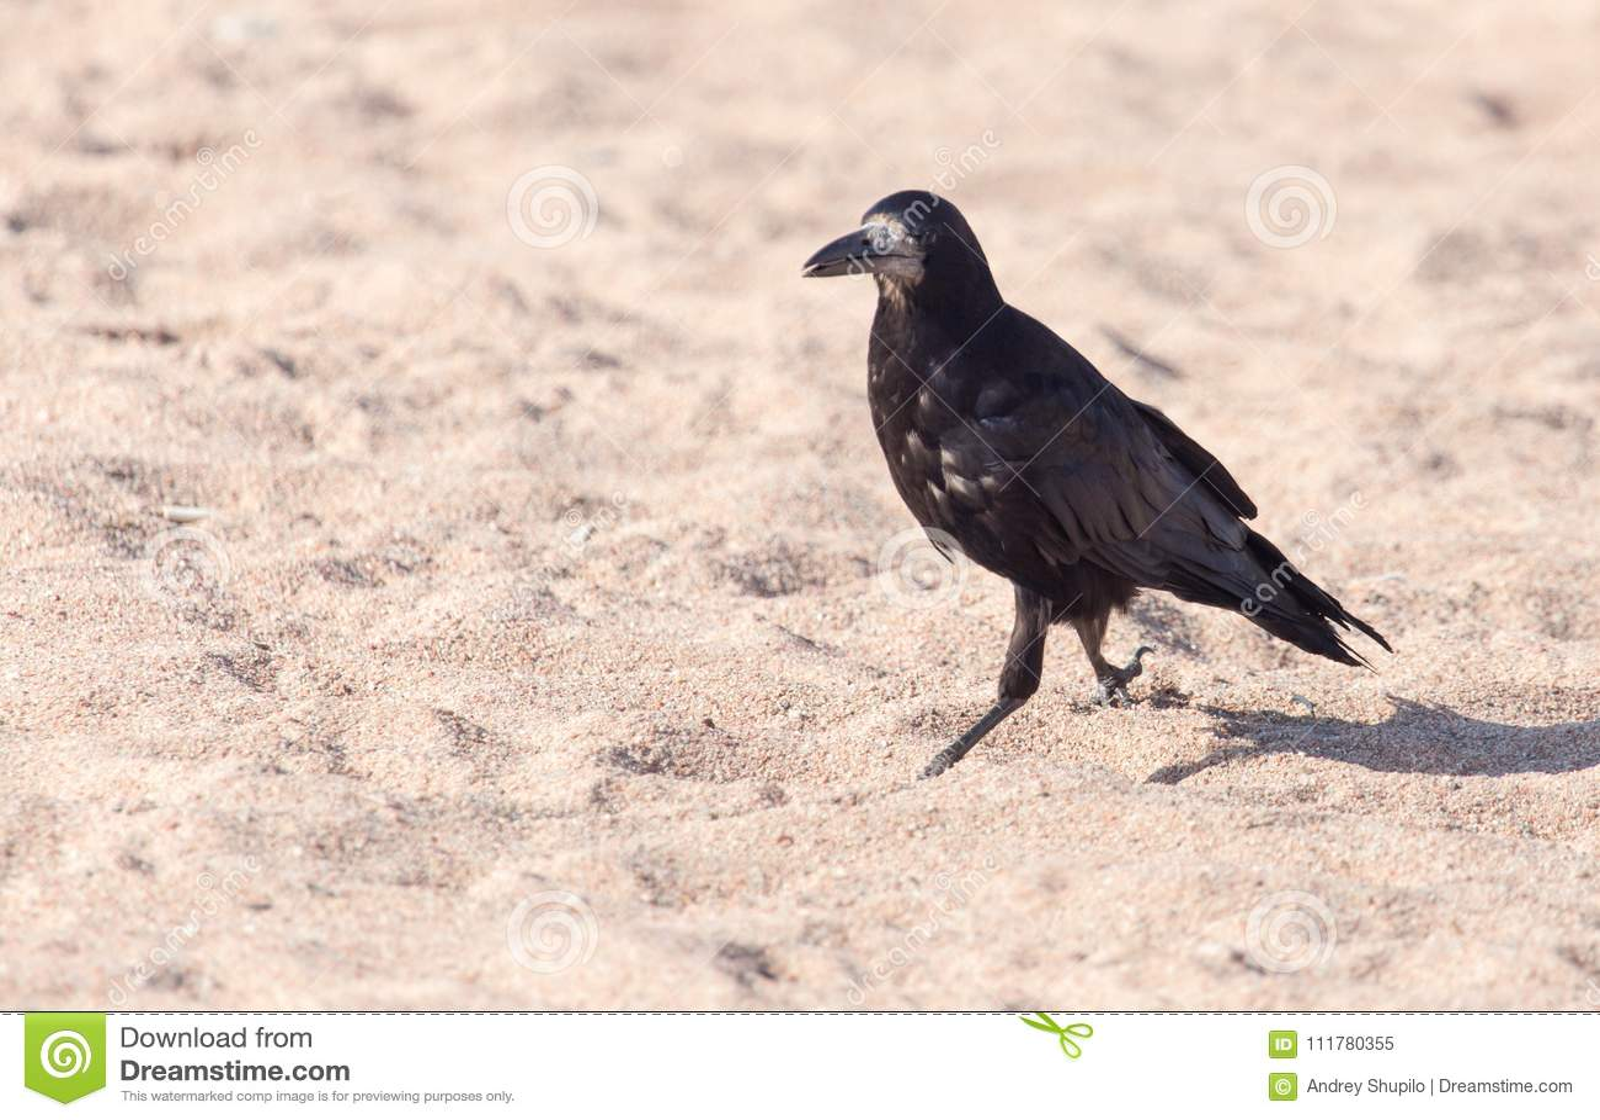 Black crow on the sand